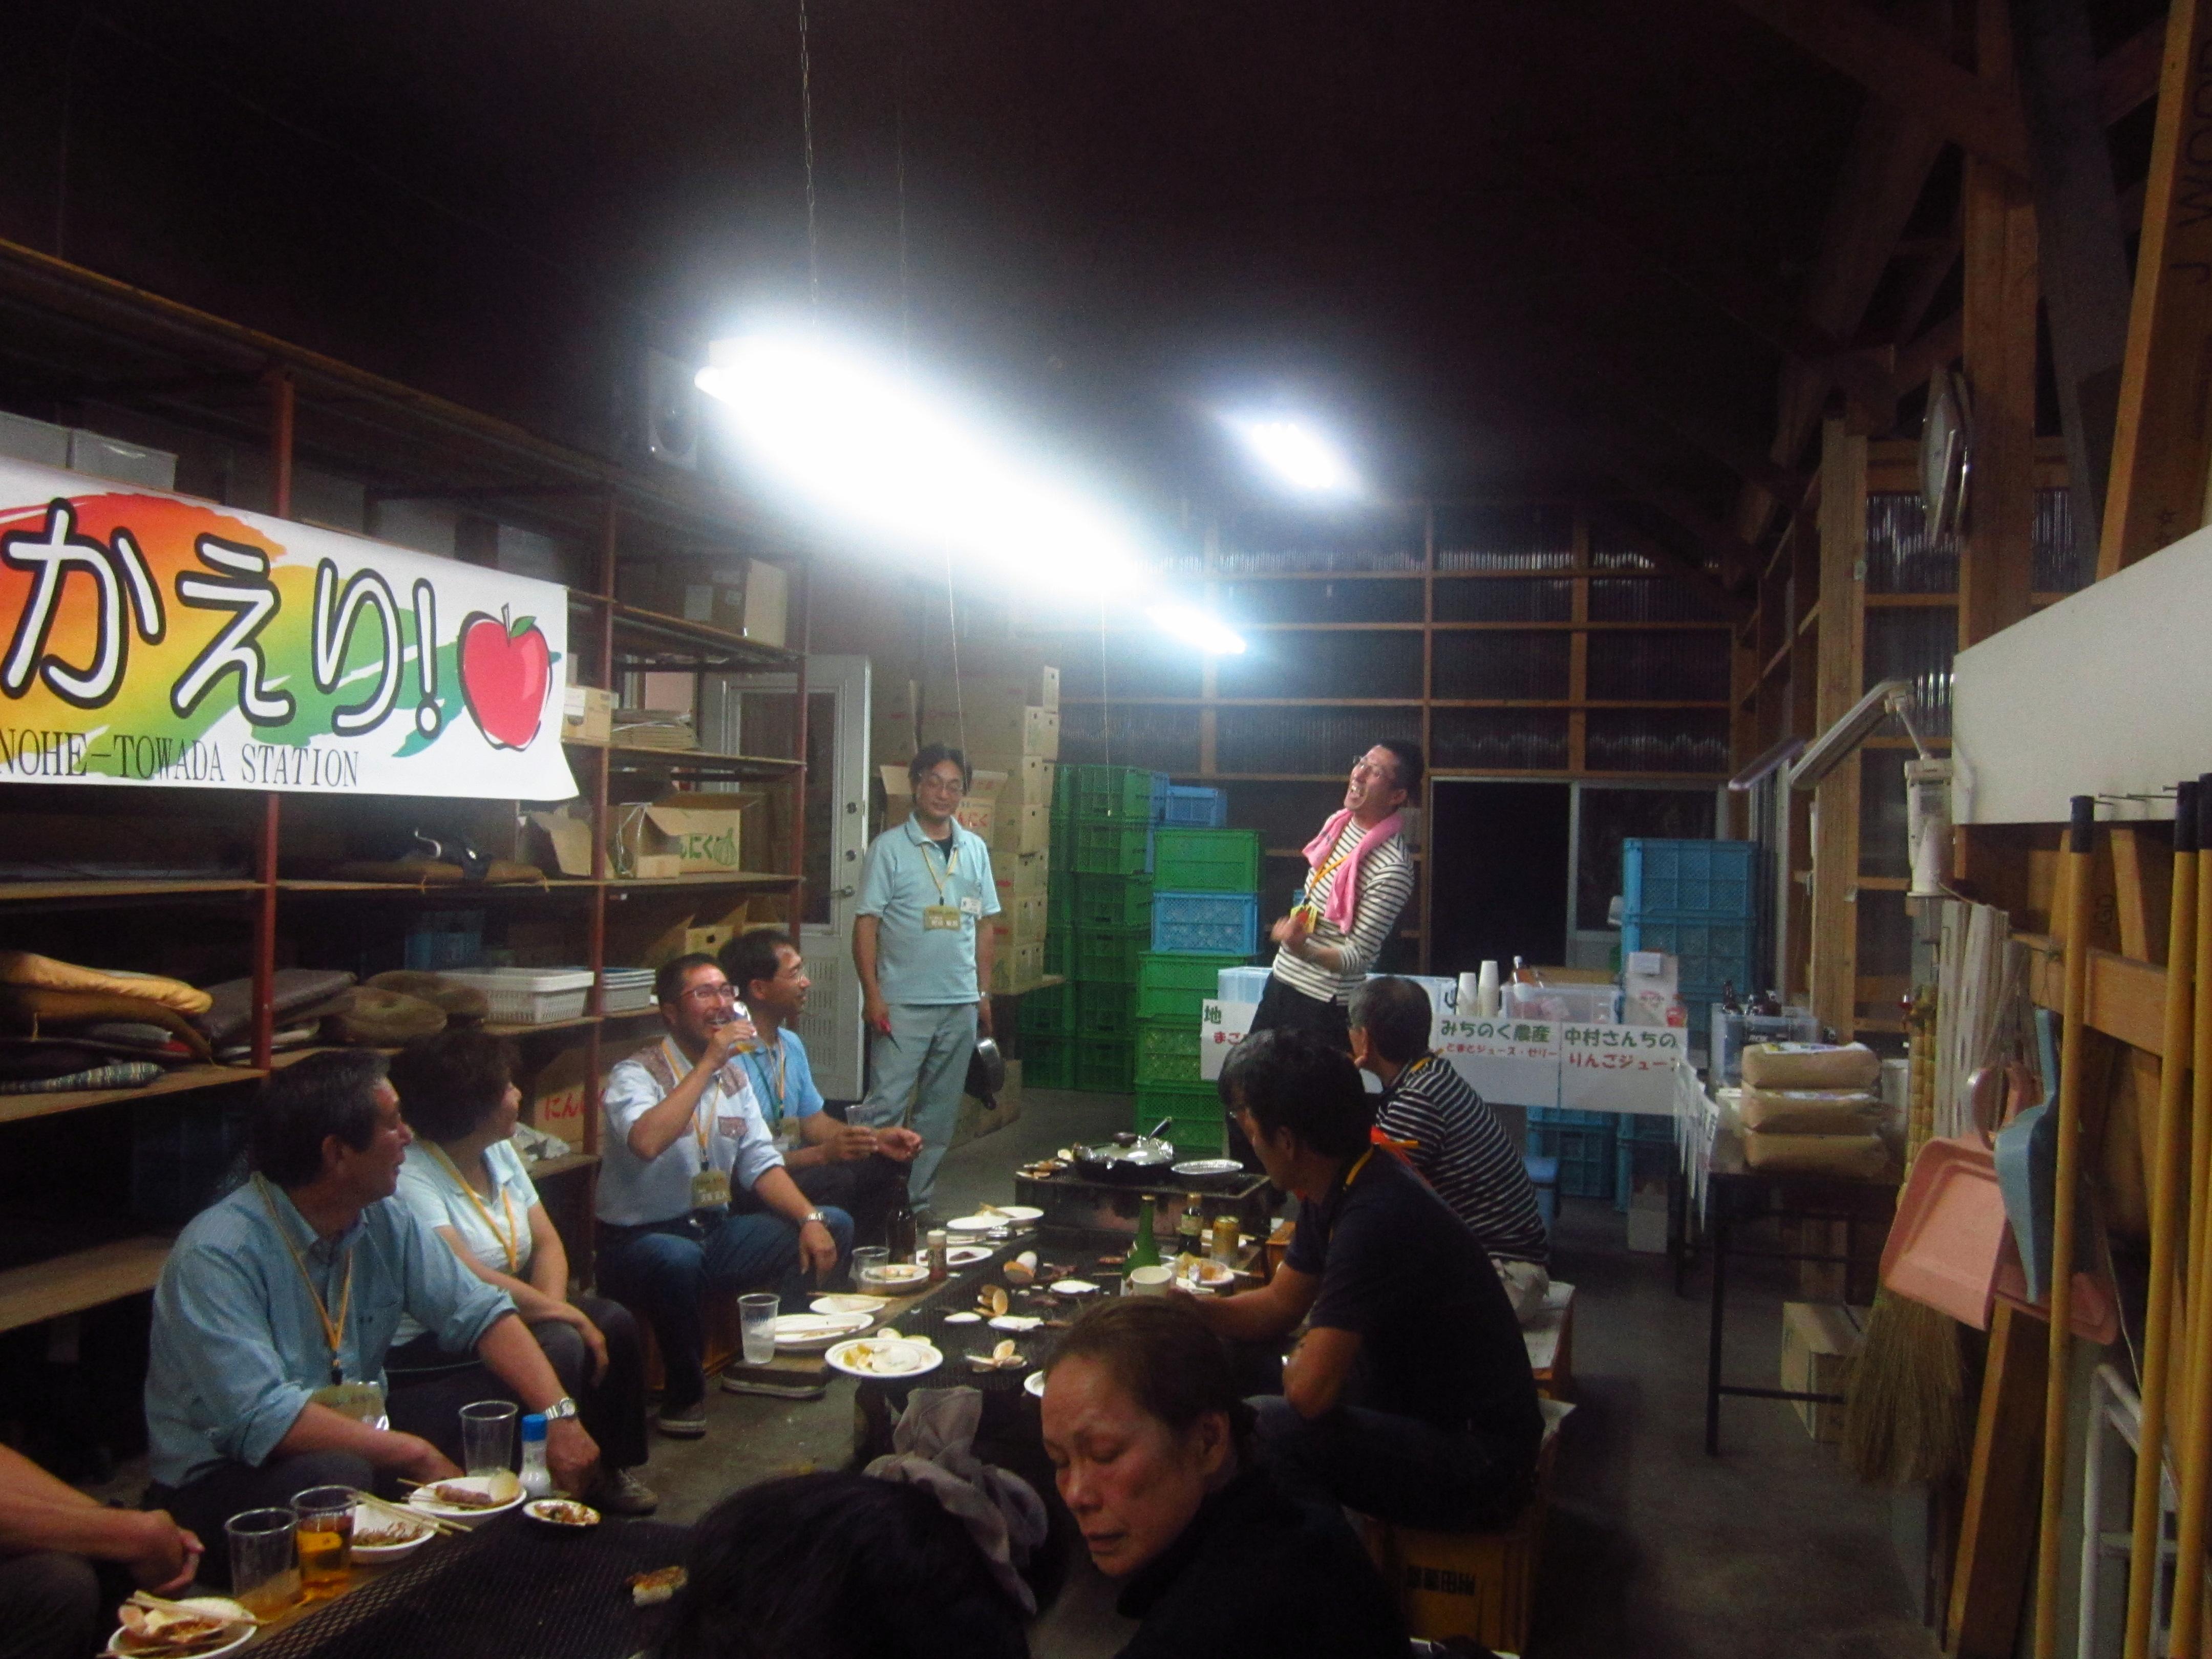 IMG 4441 - 麻布十番納涼祭り25,26日(七戸町出店)